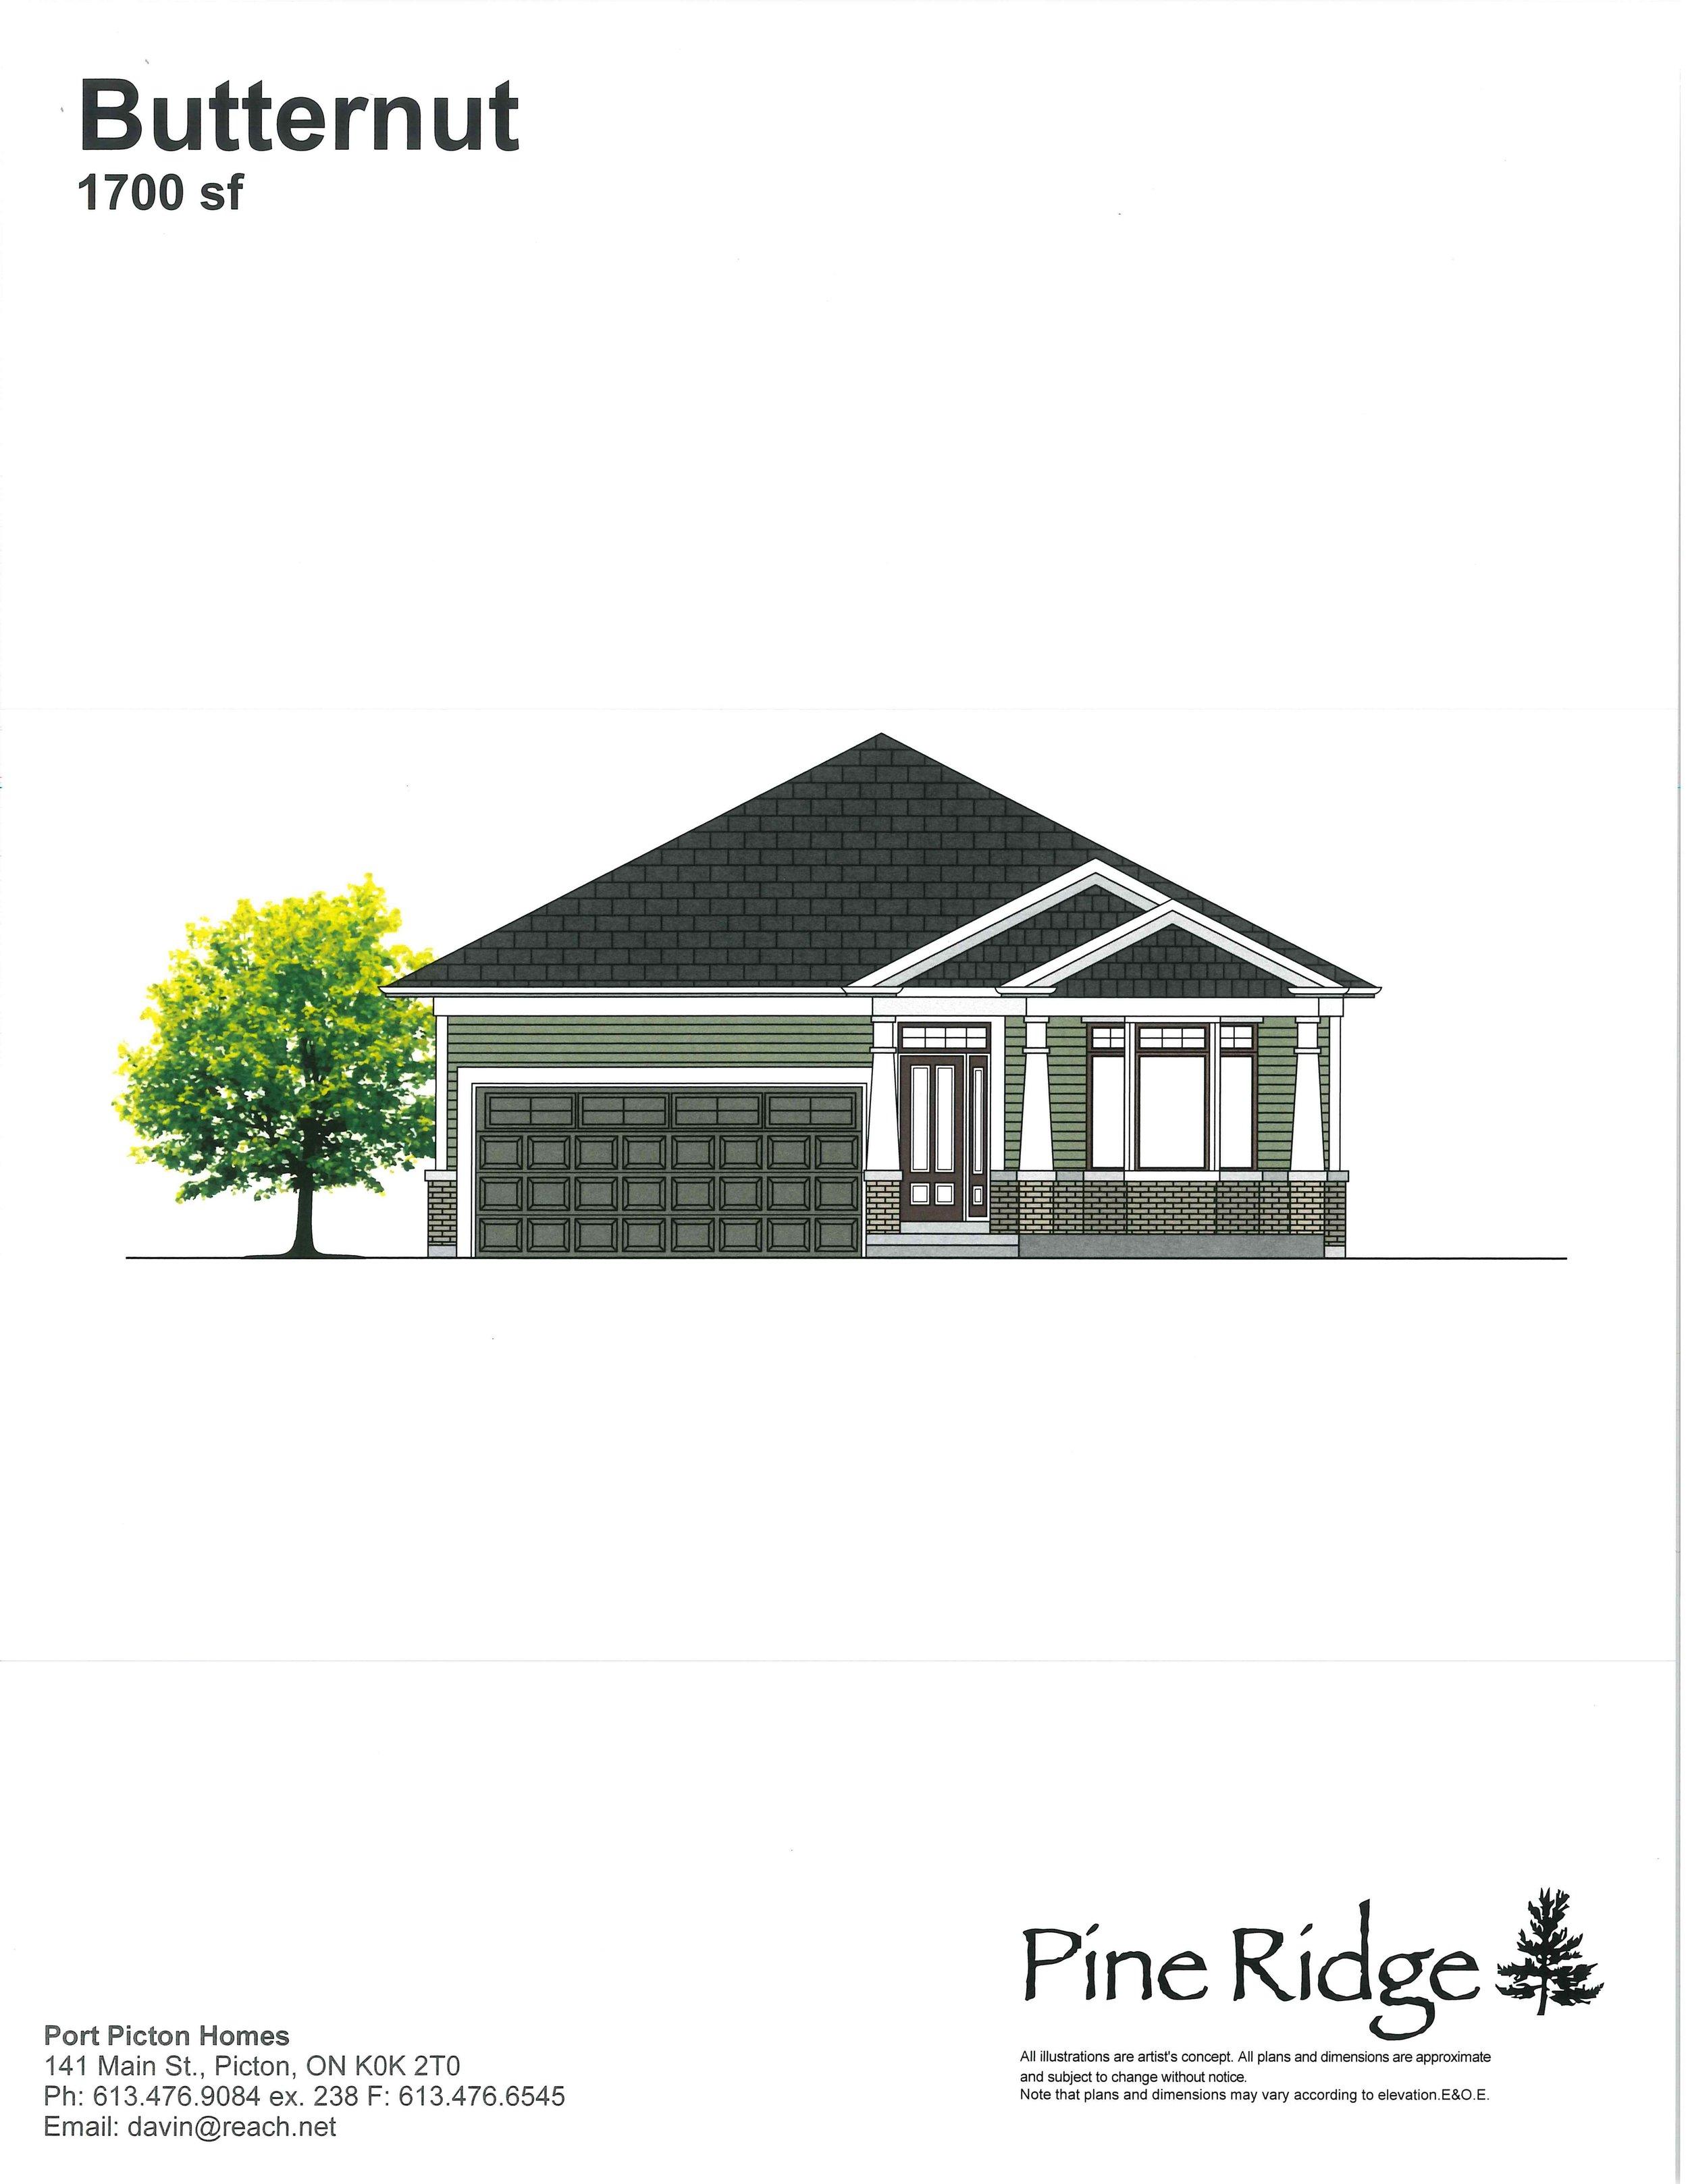 pineridge floorplans 1_Page_7.jpg